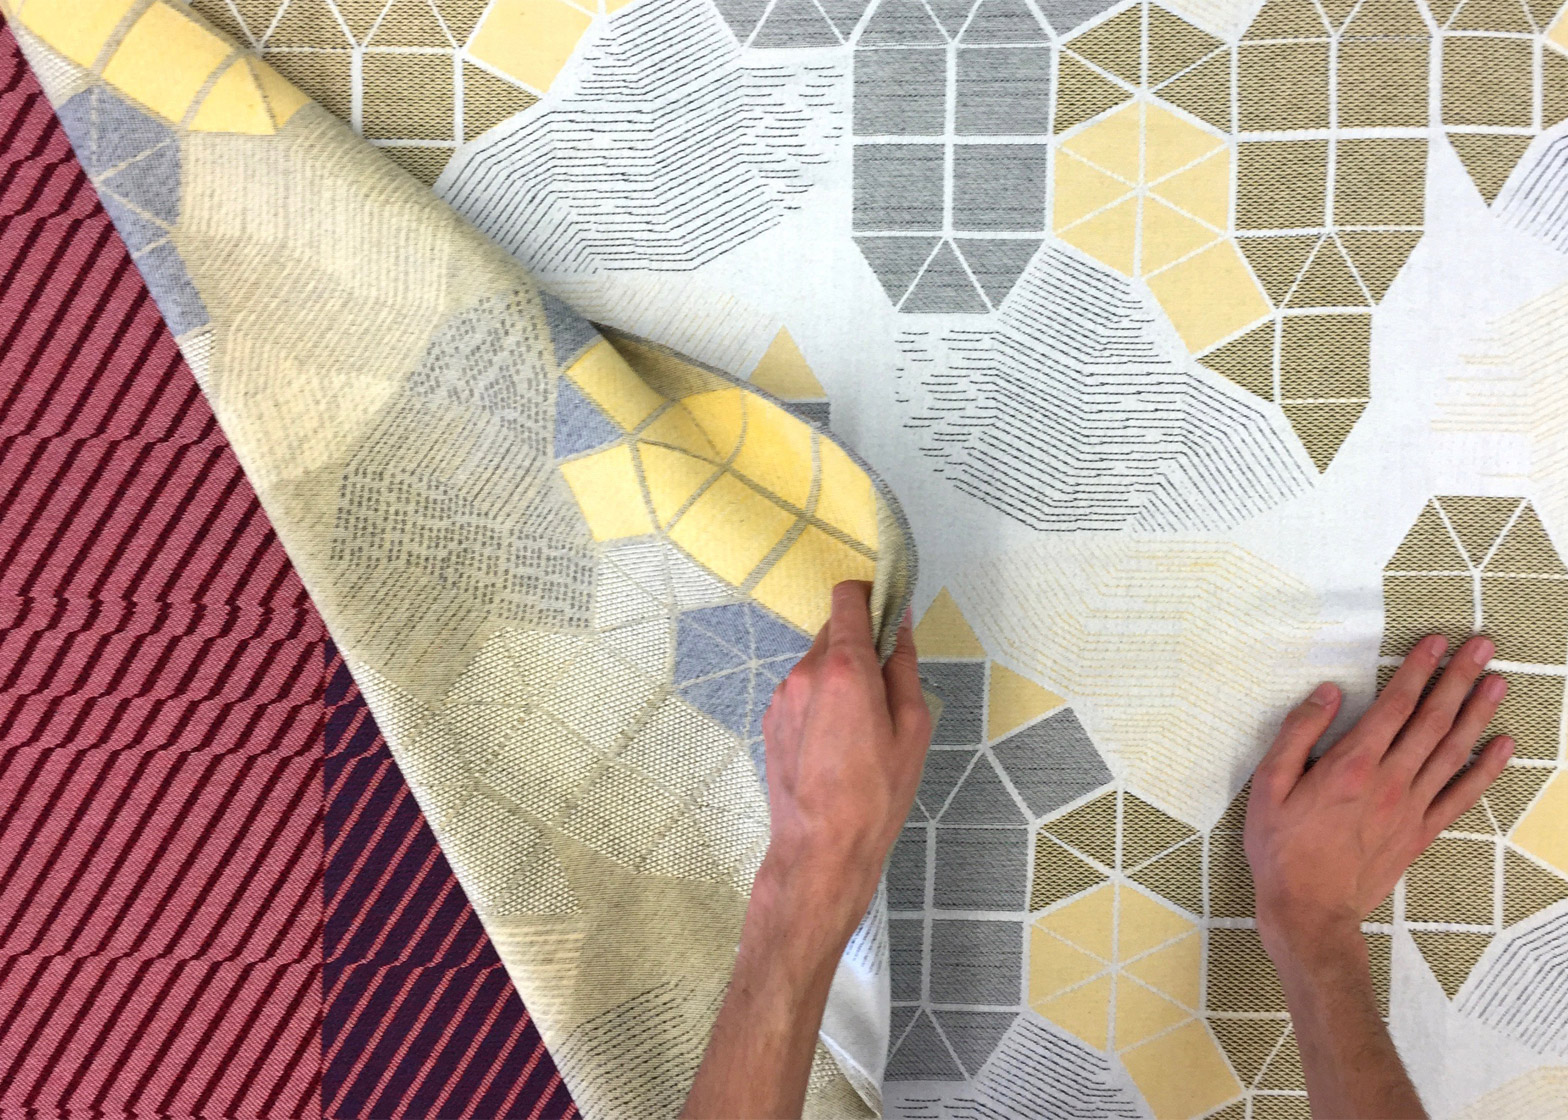 Wovns platform turns digital designs into Jacquard fabric